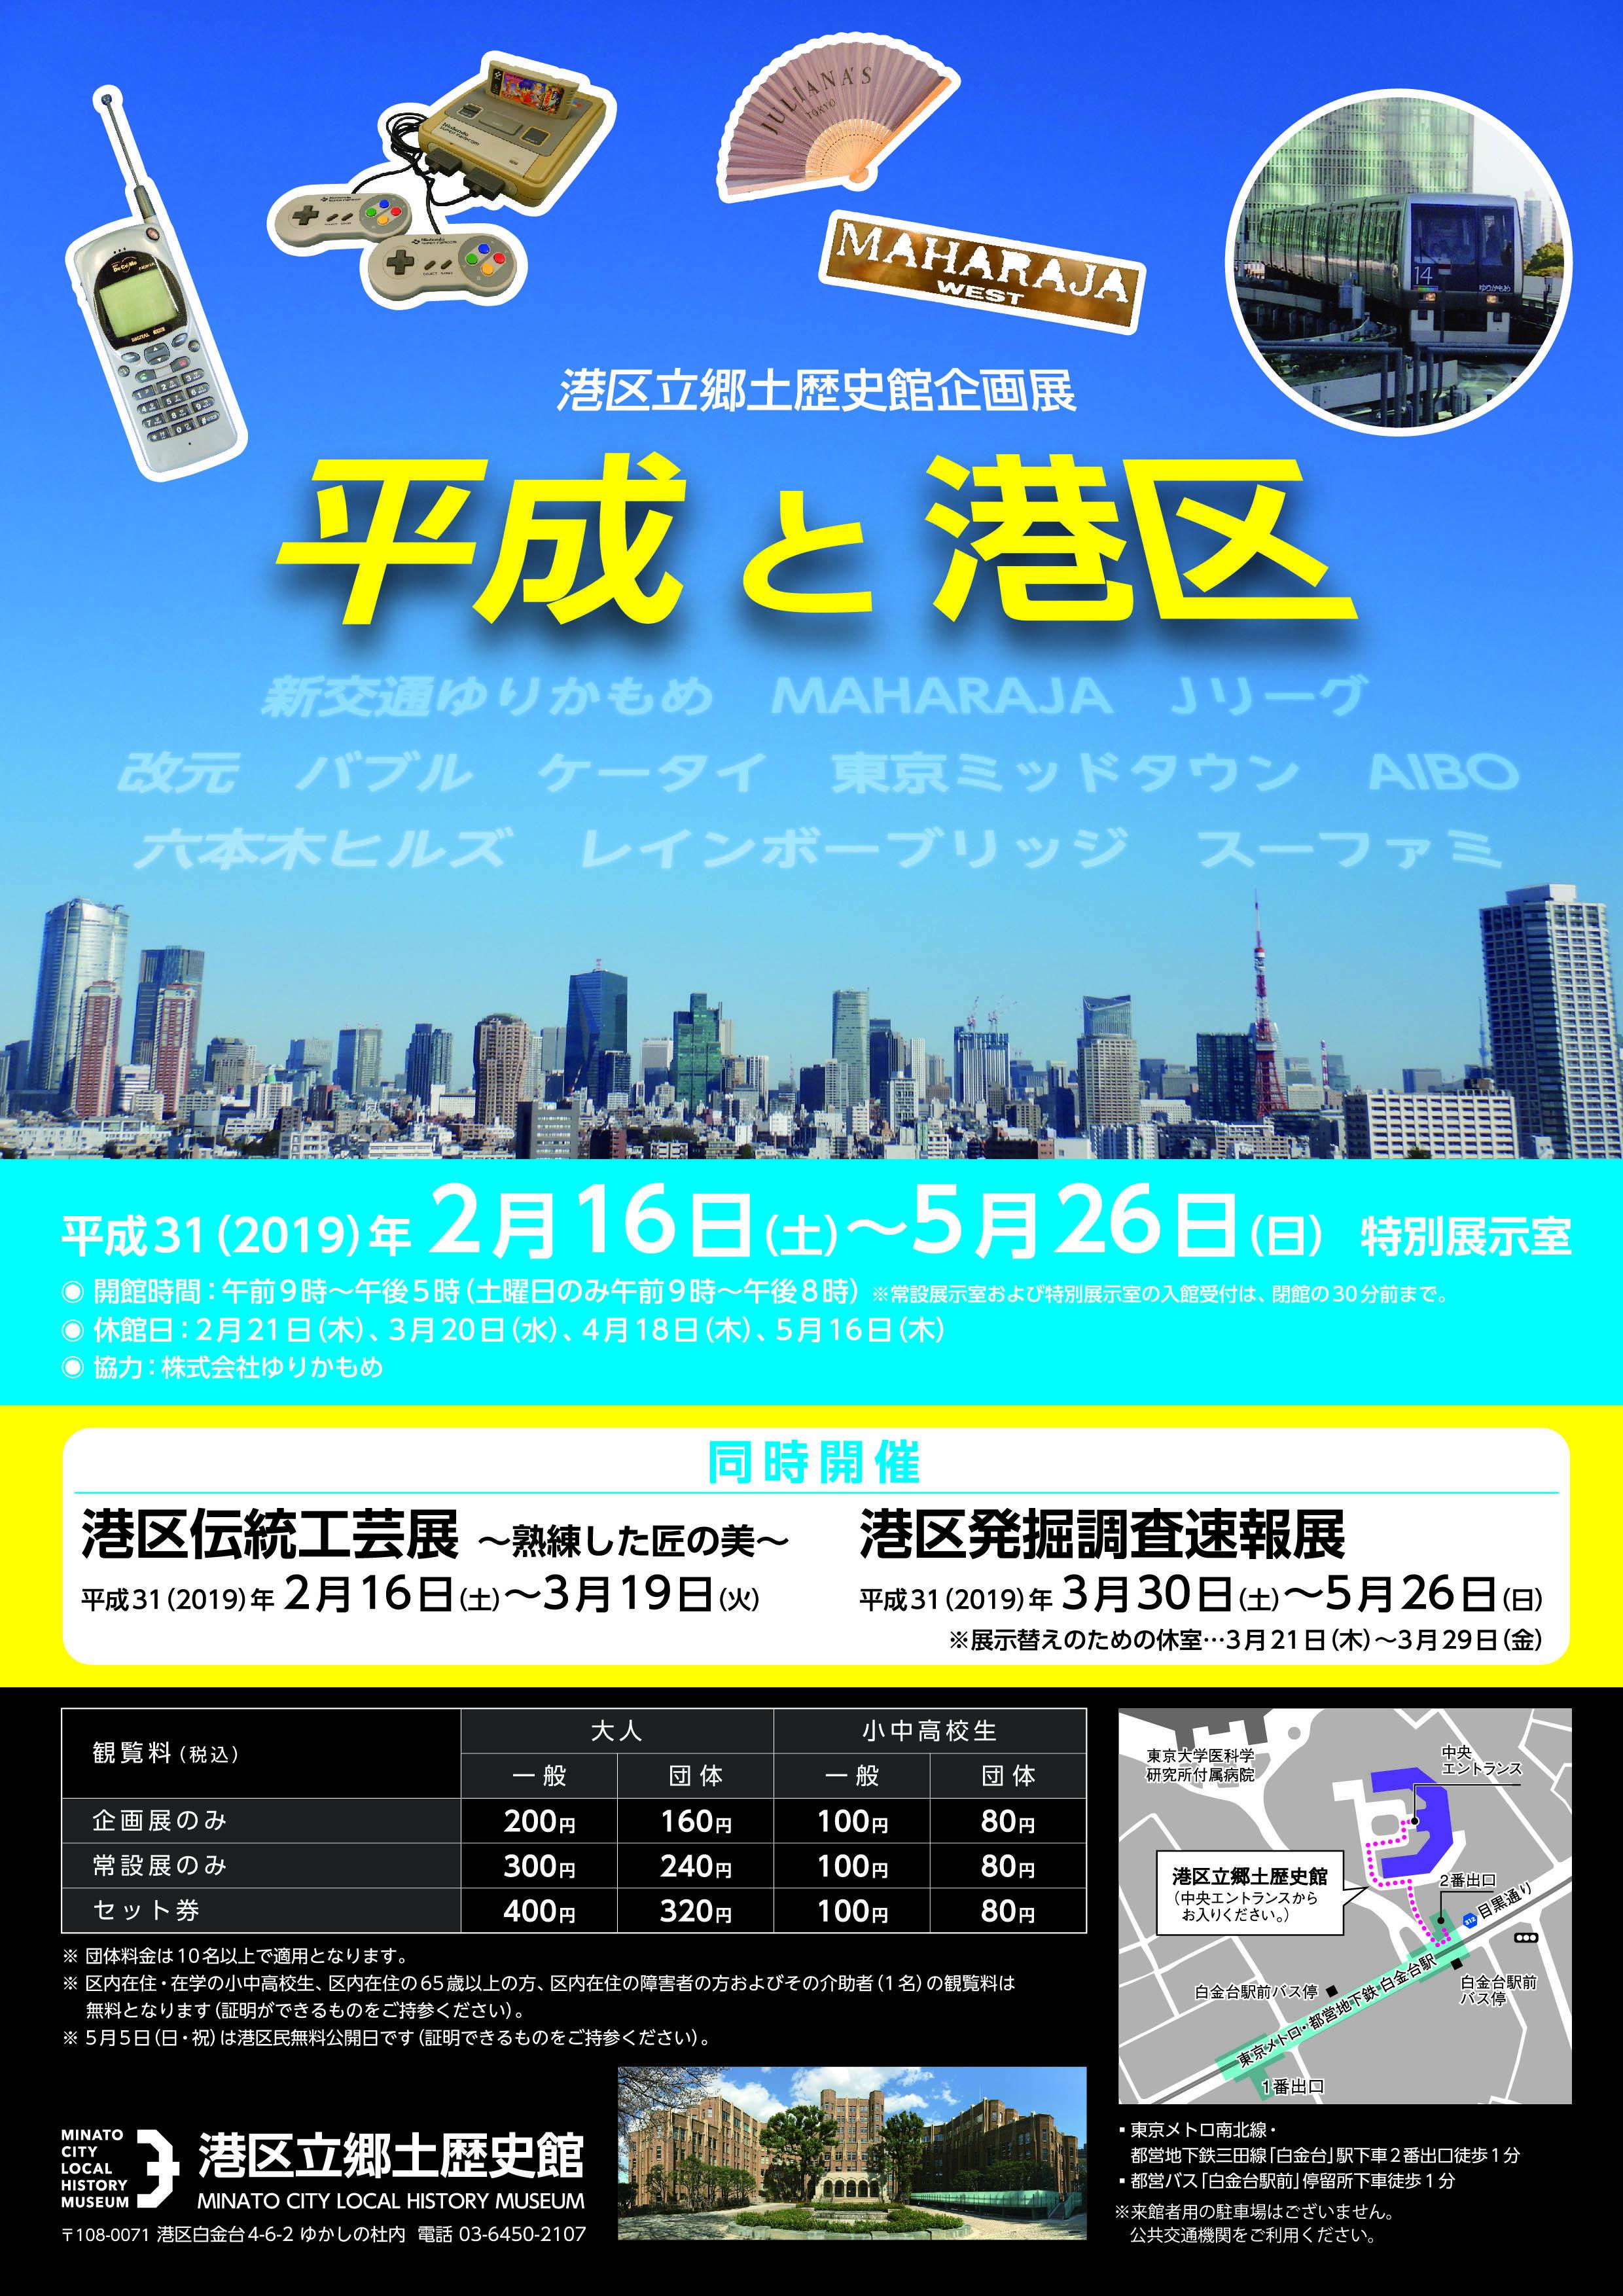 heisei_minatoku-thumb-2480x3508-519